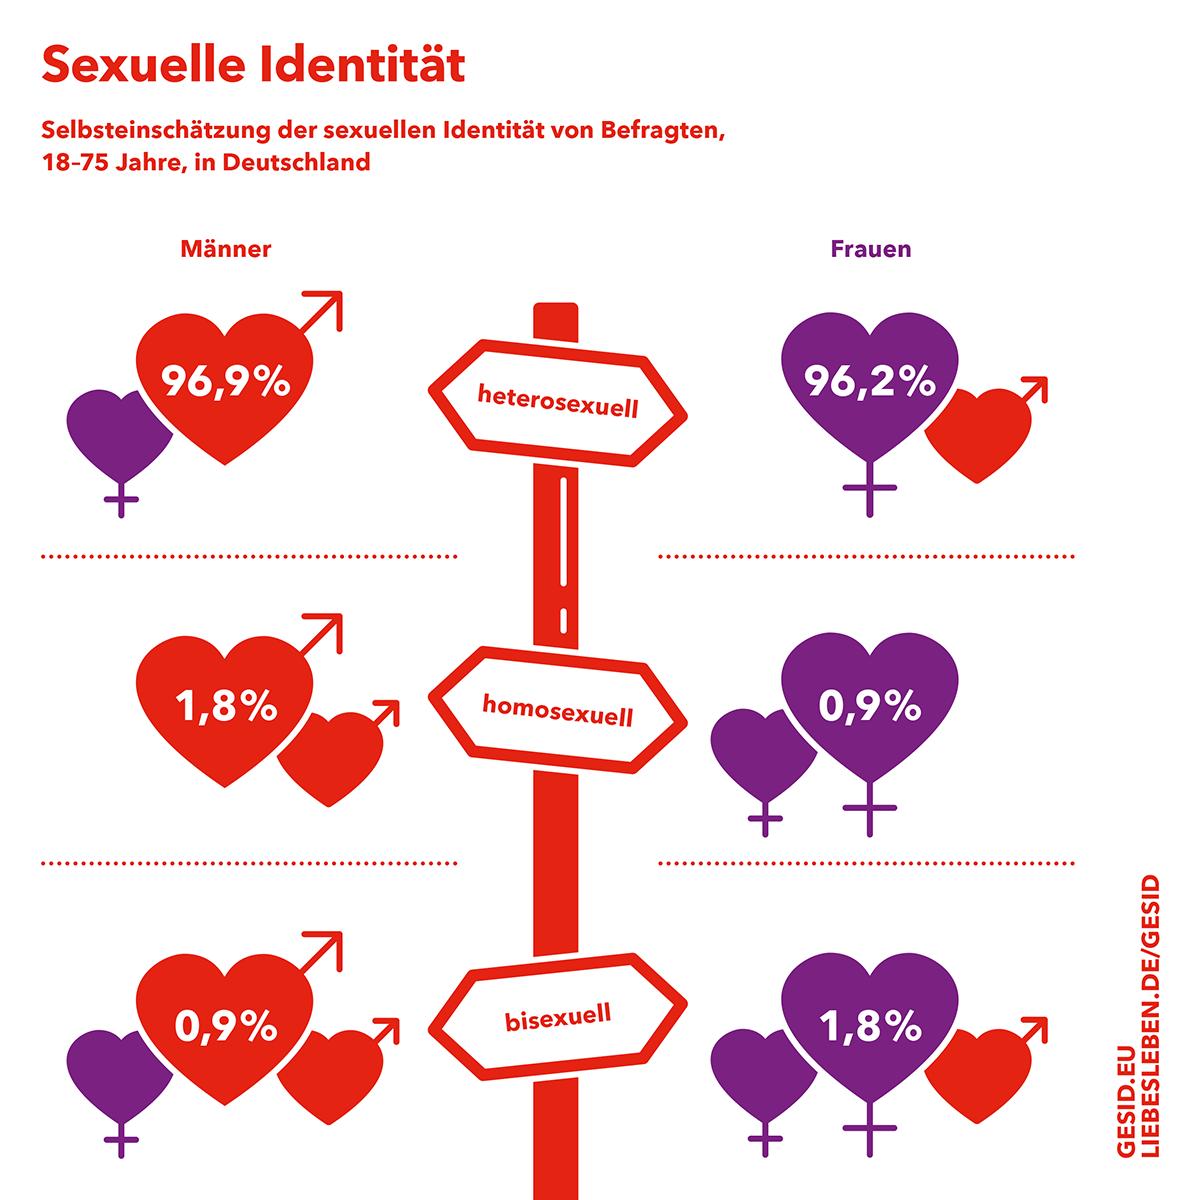 LL_GESID_Infografik_Quadratisch_Sexuelle_Identitaet